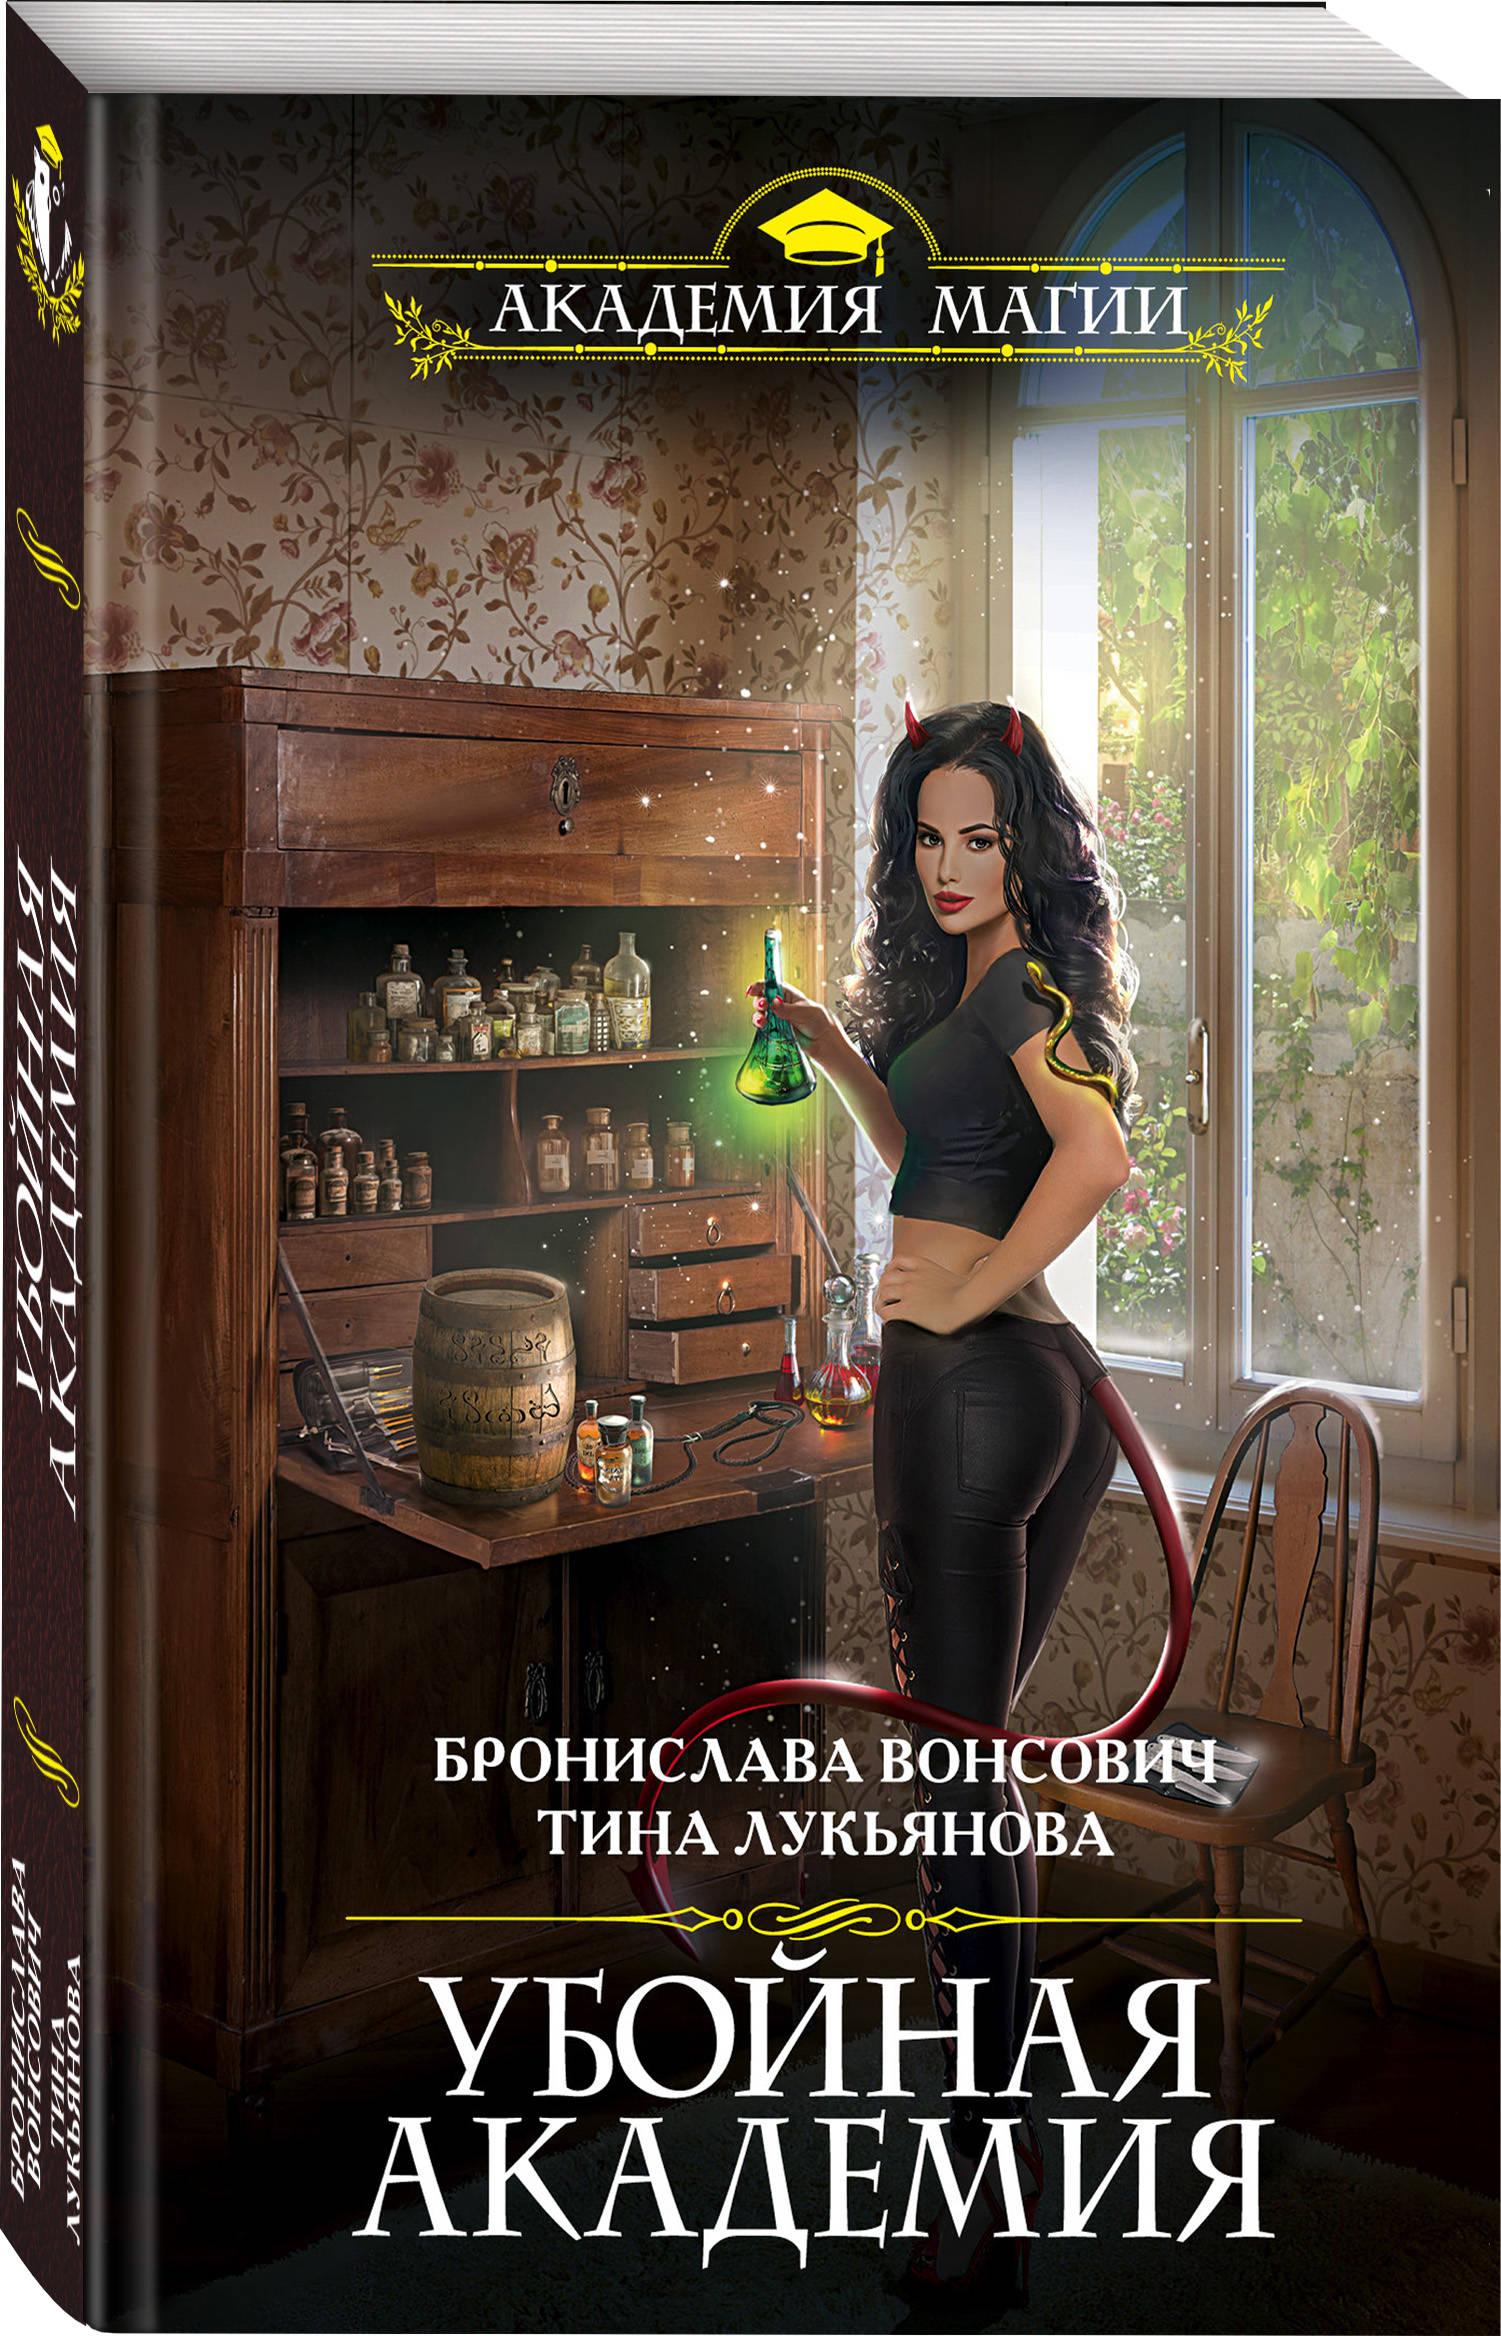 Убойная Академия ( Вонсович Бронислава, Лукьянова Тина  )